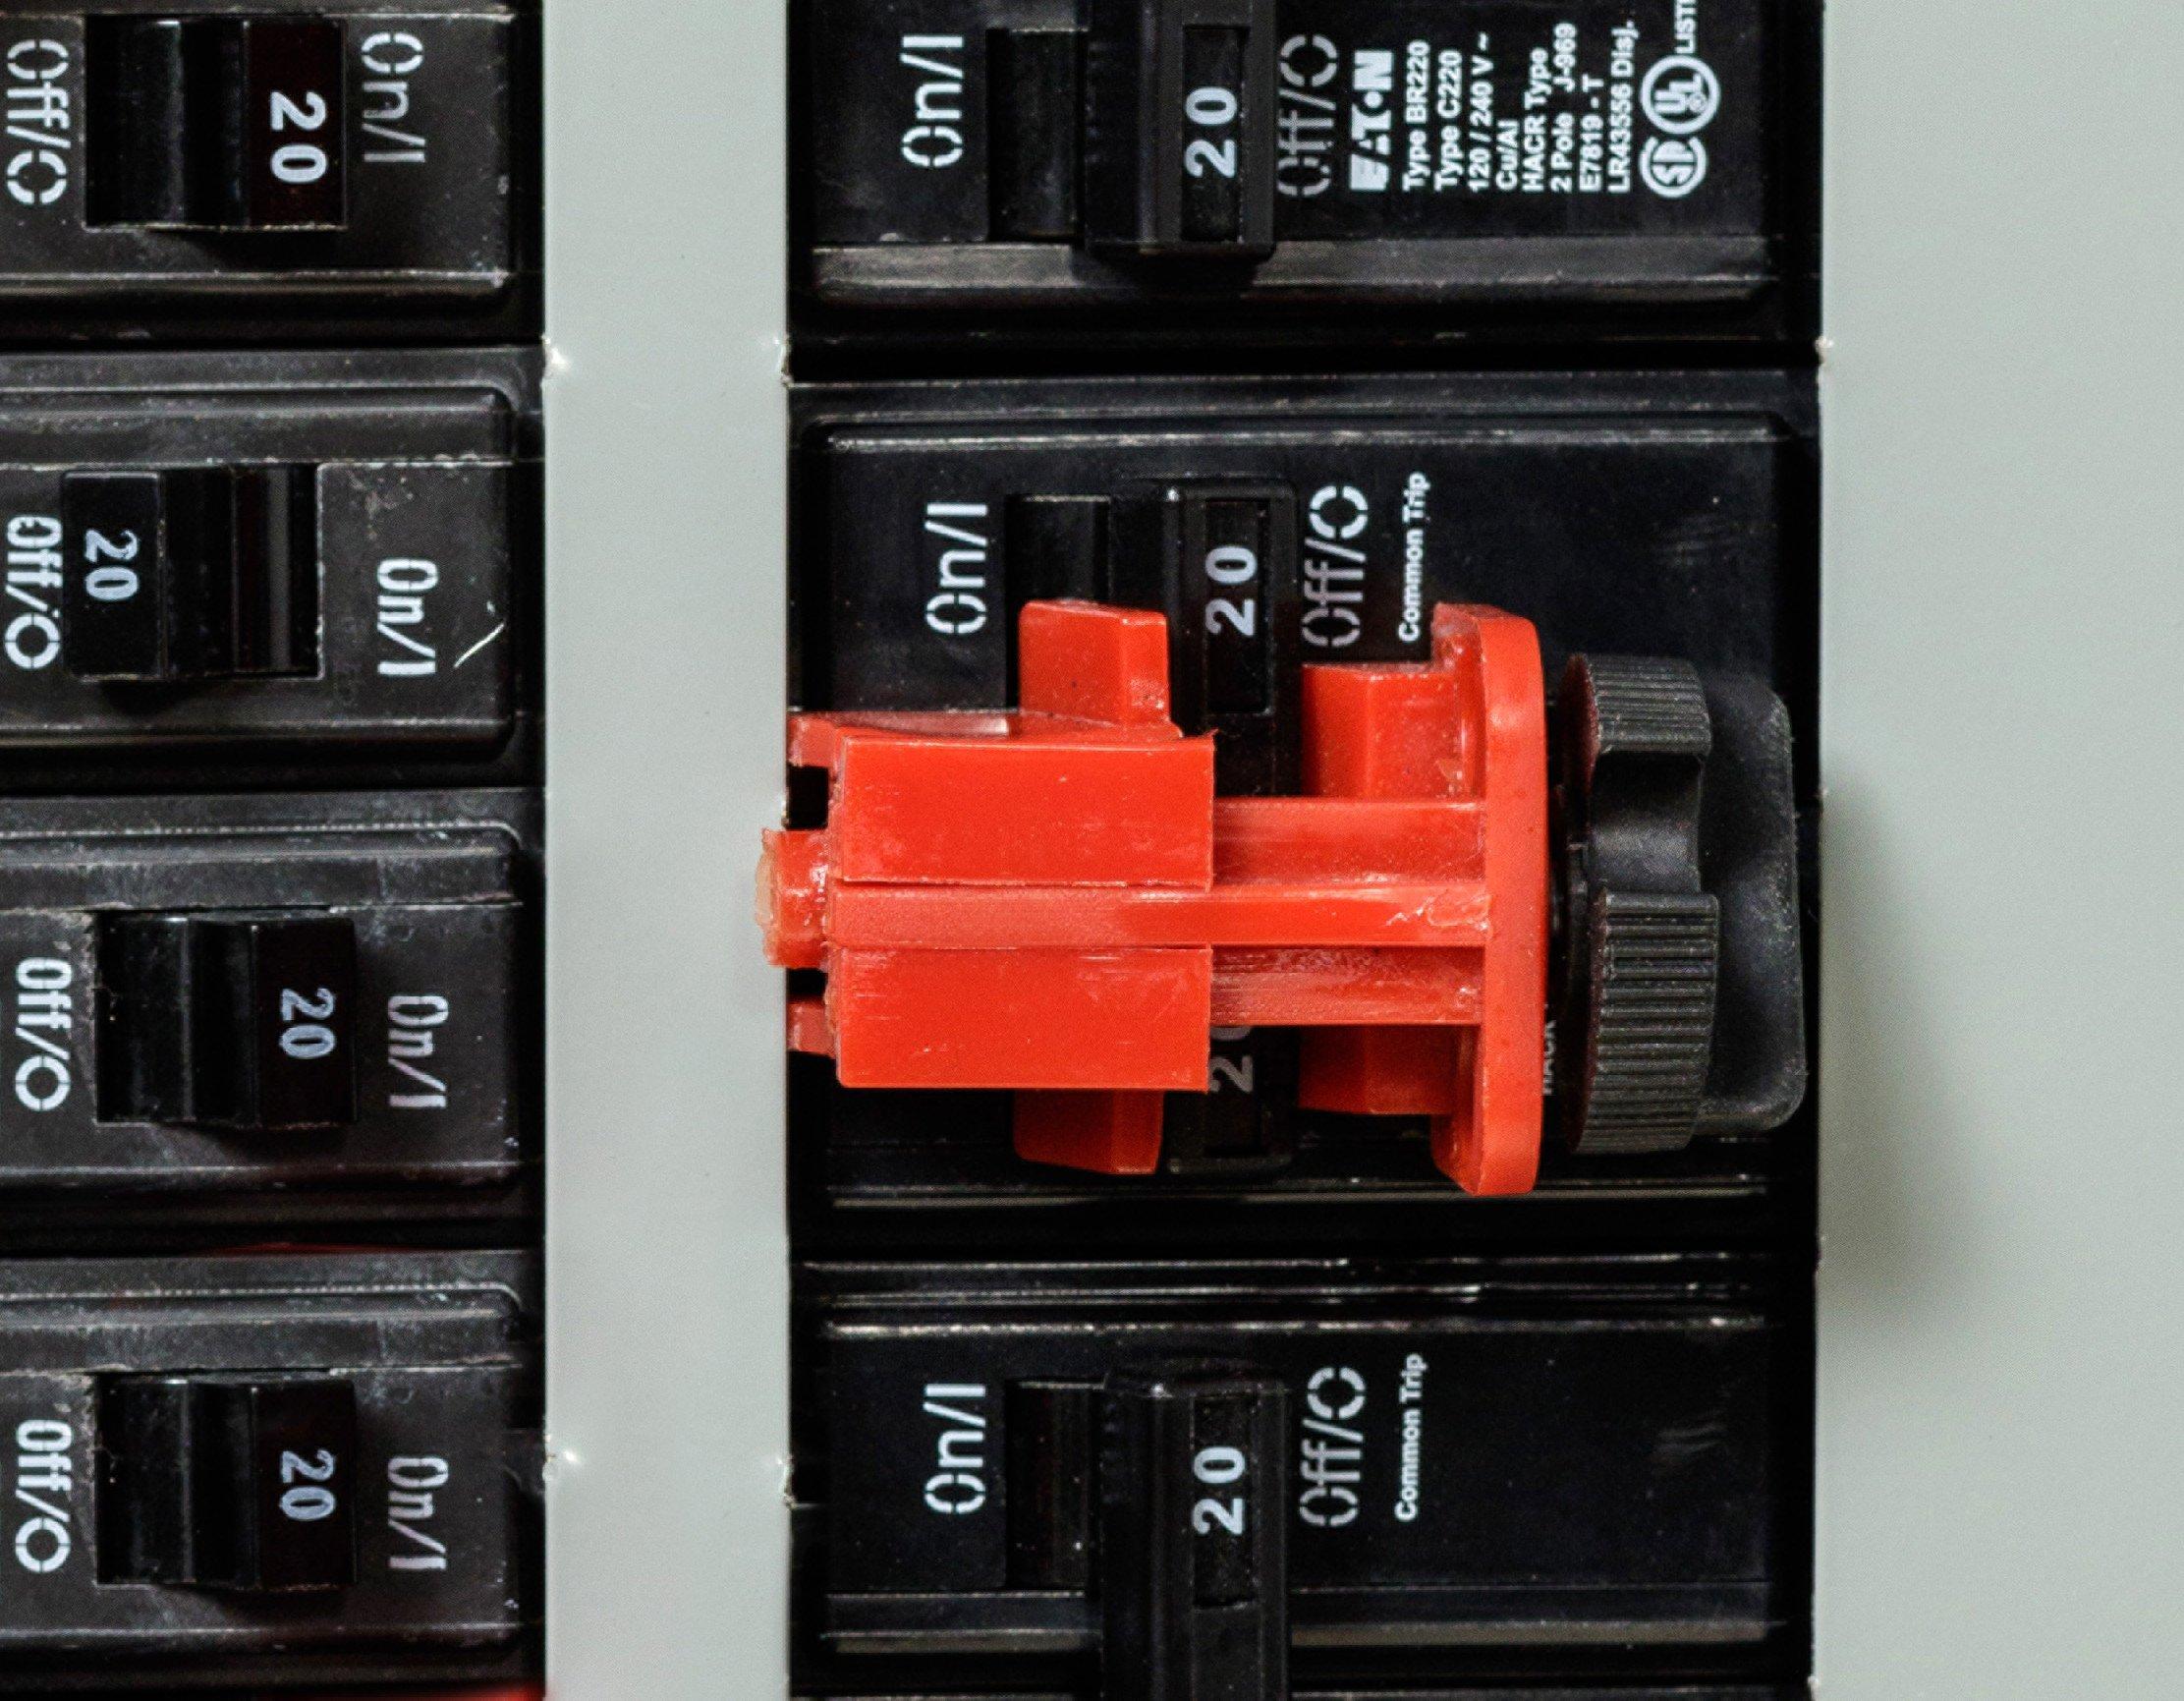 Brady Ready Access Valve And Electrical Lockout Station, Includes 6 Safety Padlocks